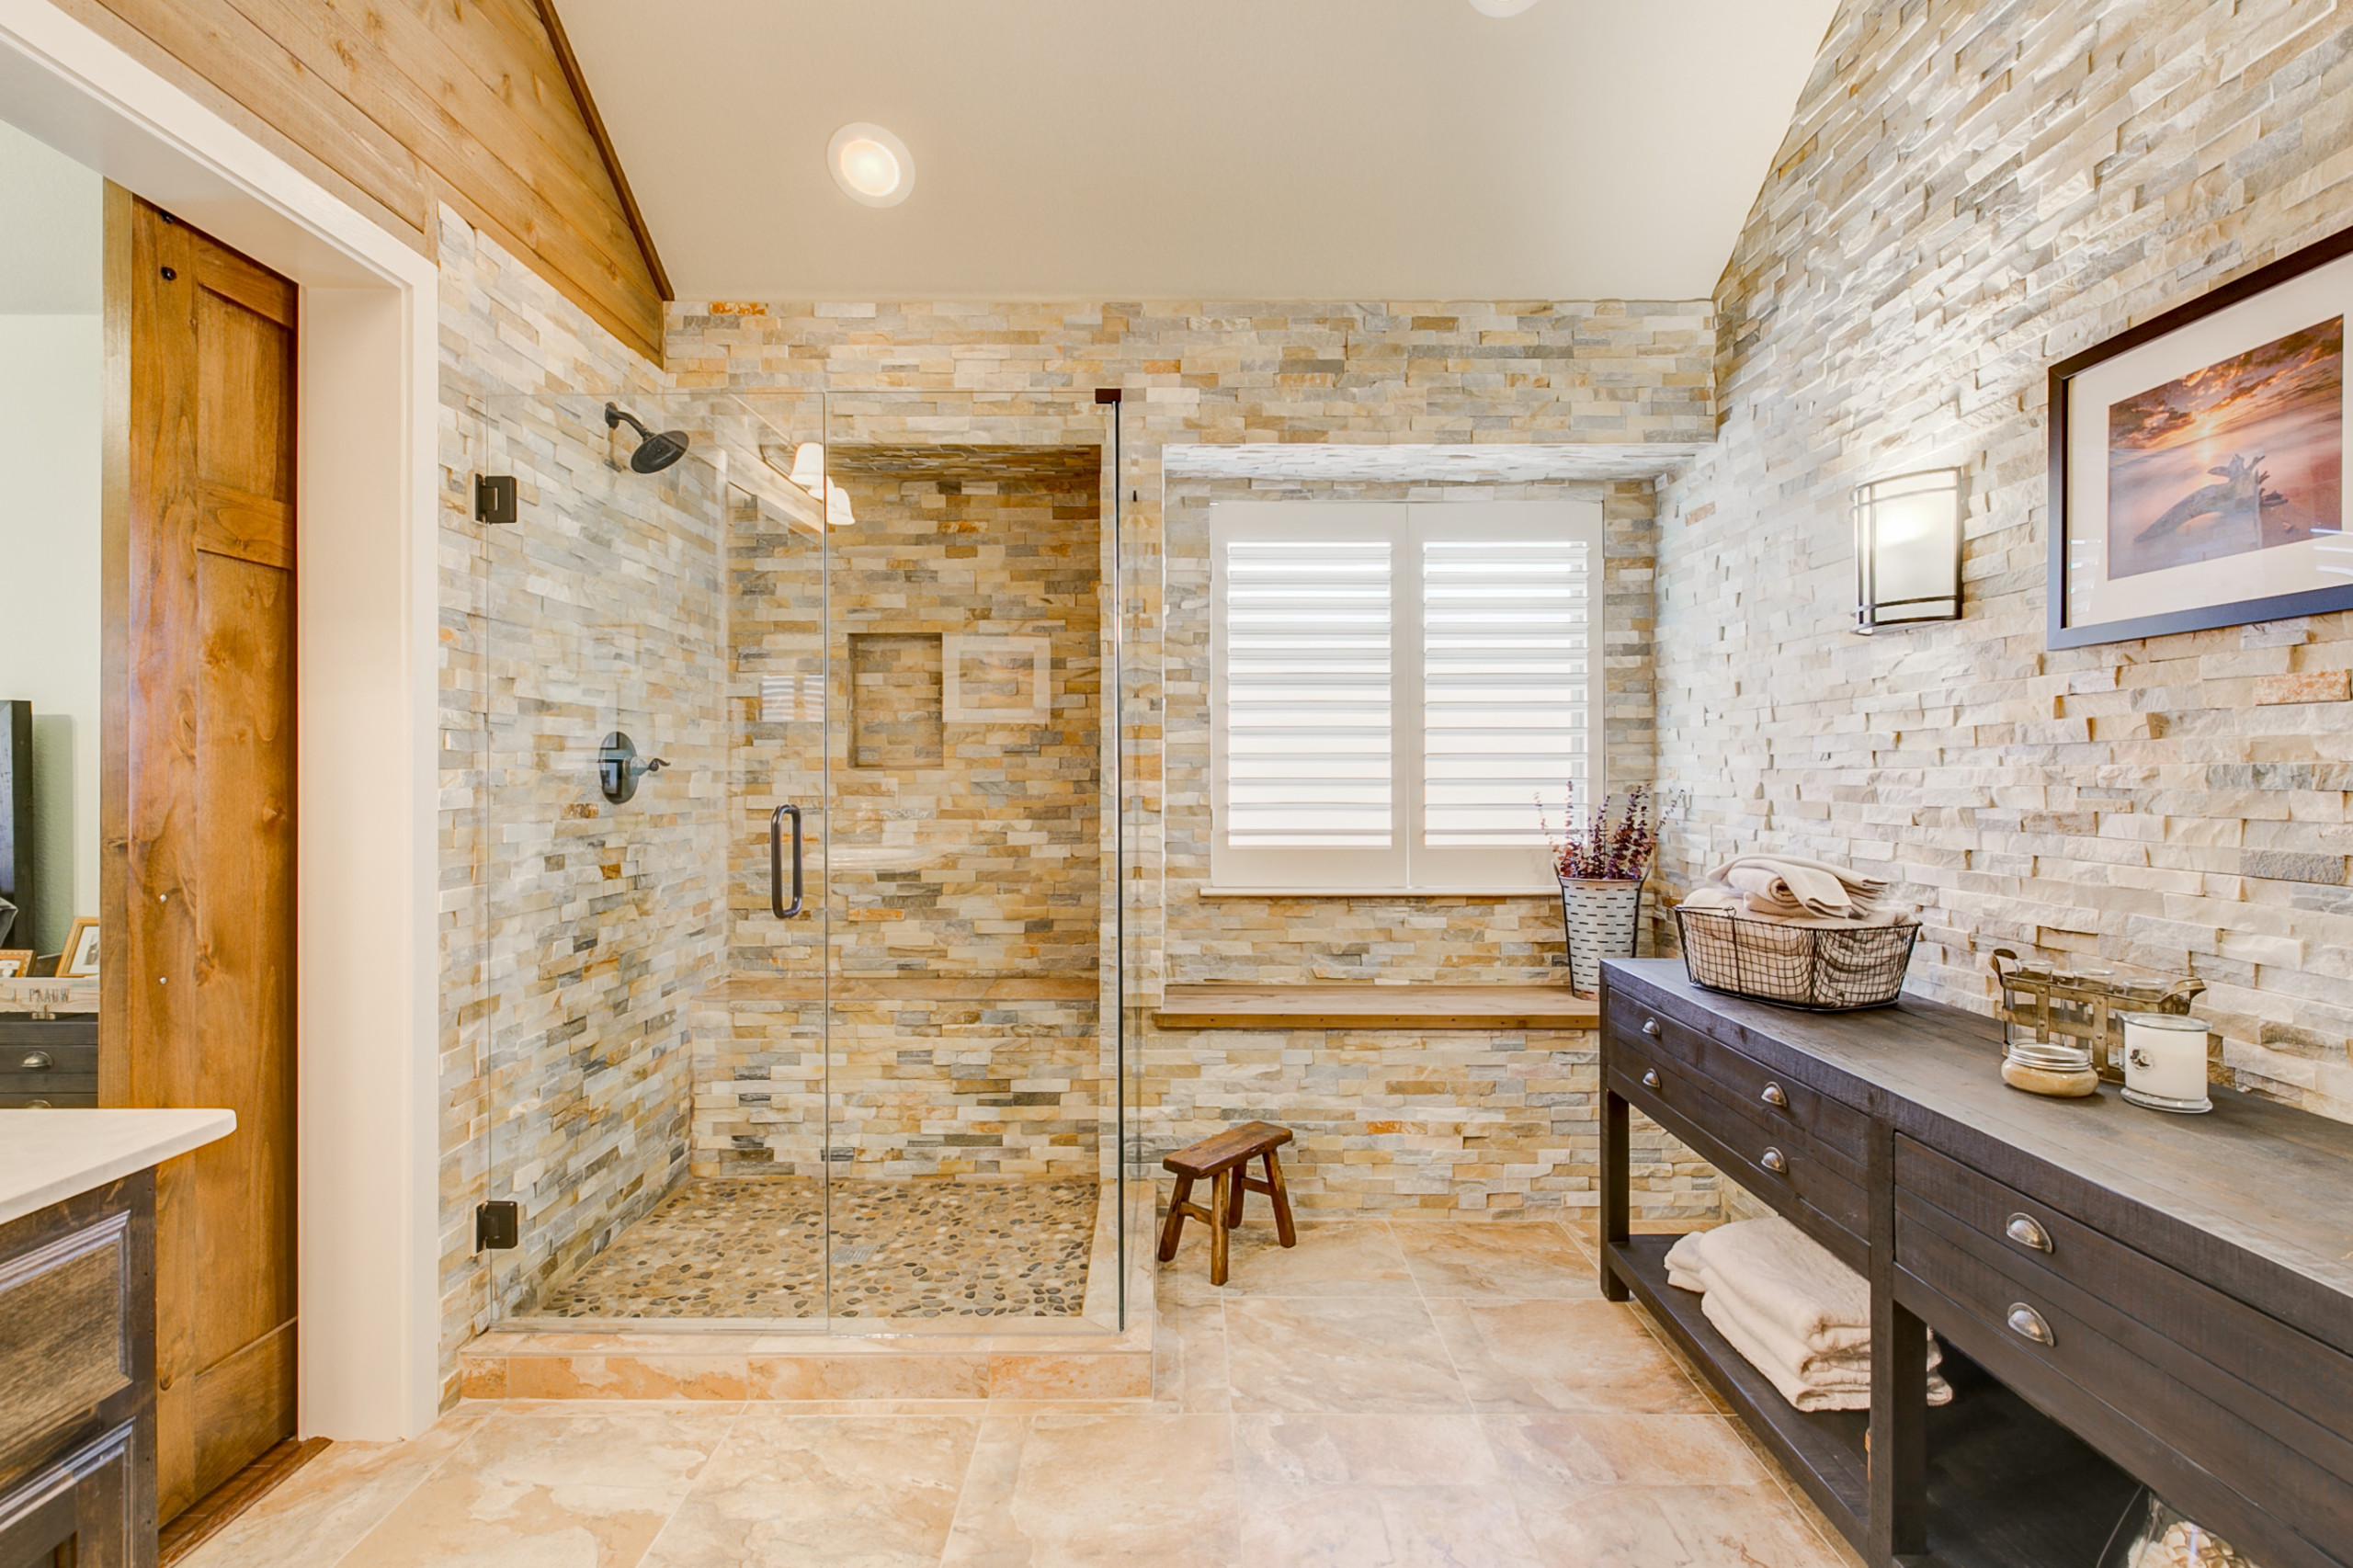 Donovan Ct - Master Bath & Guest Bath Remodel